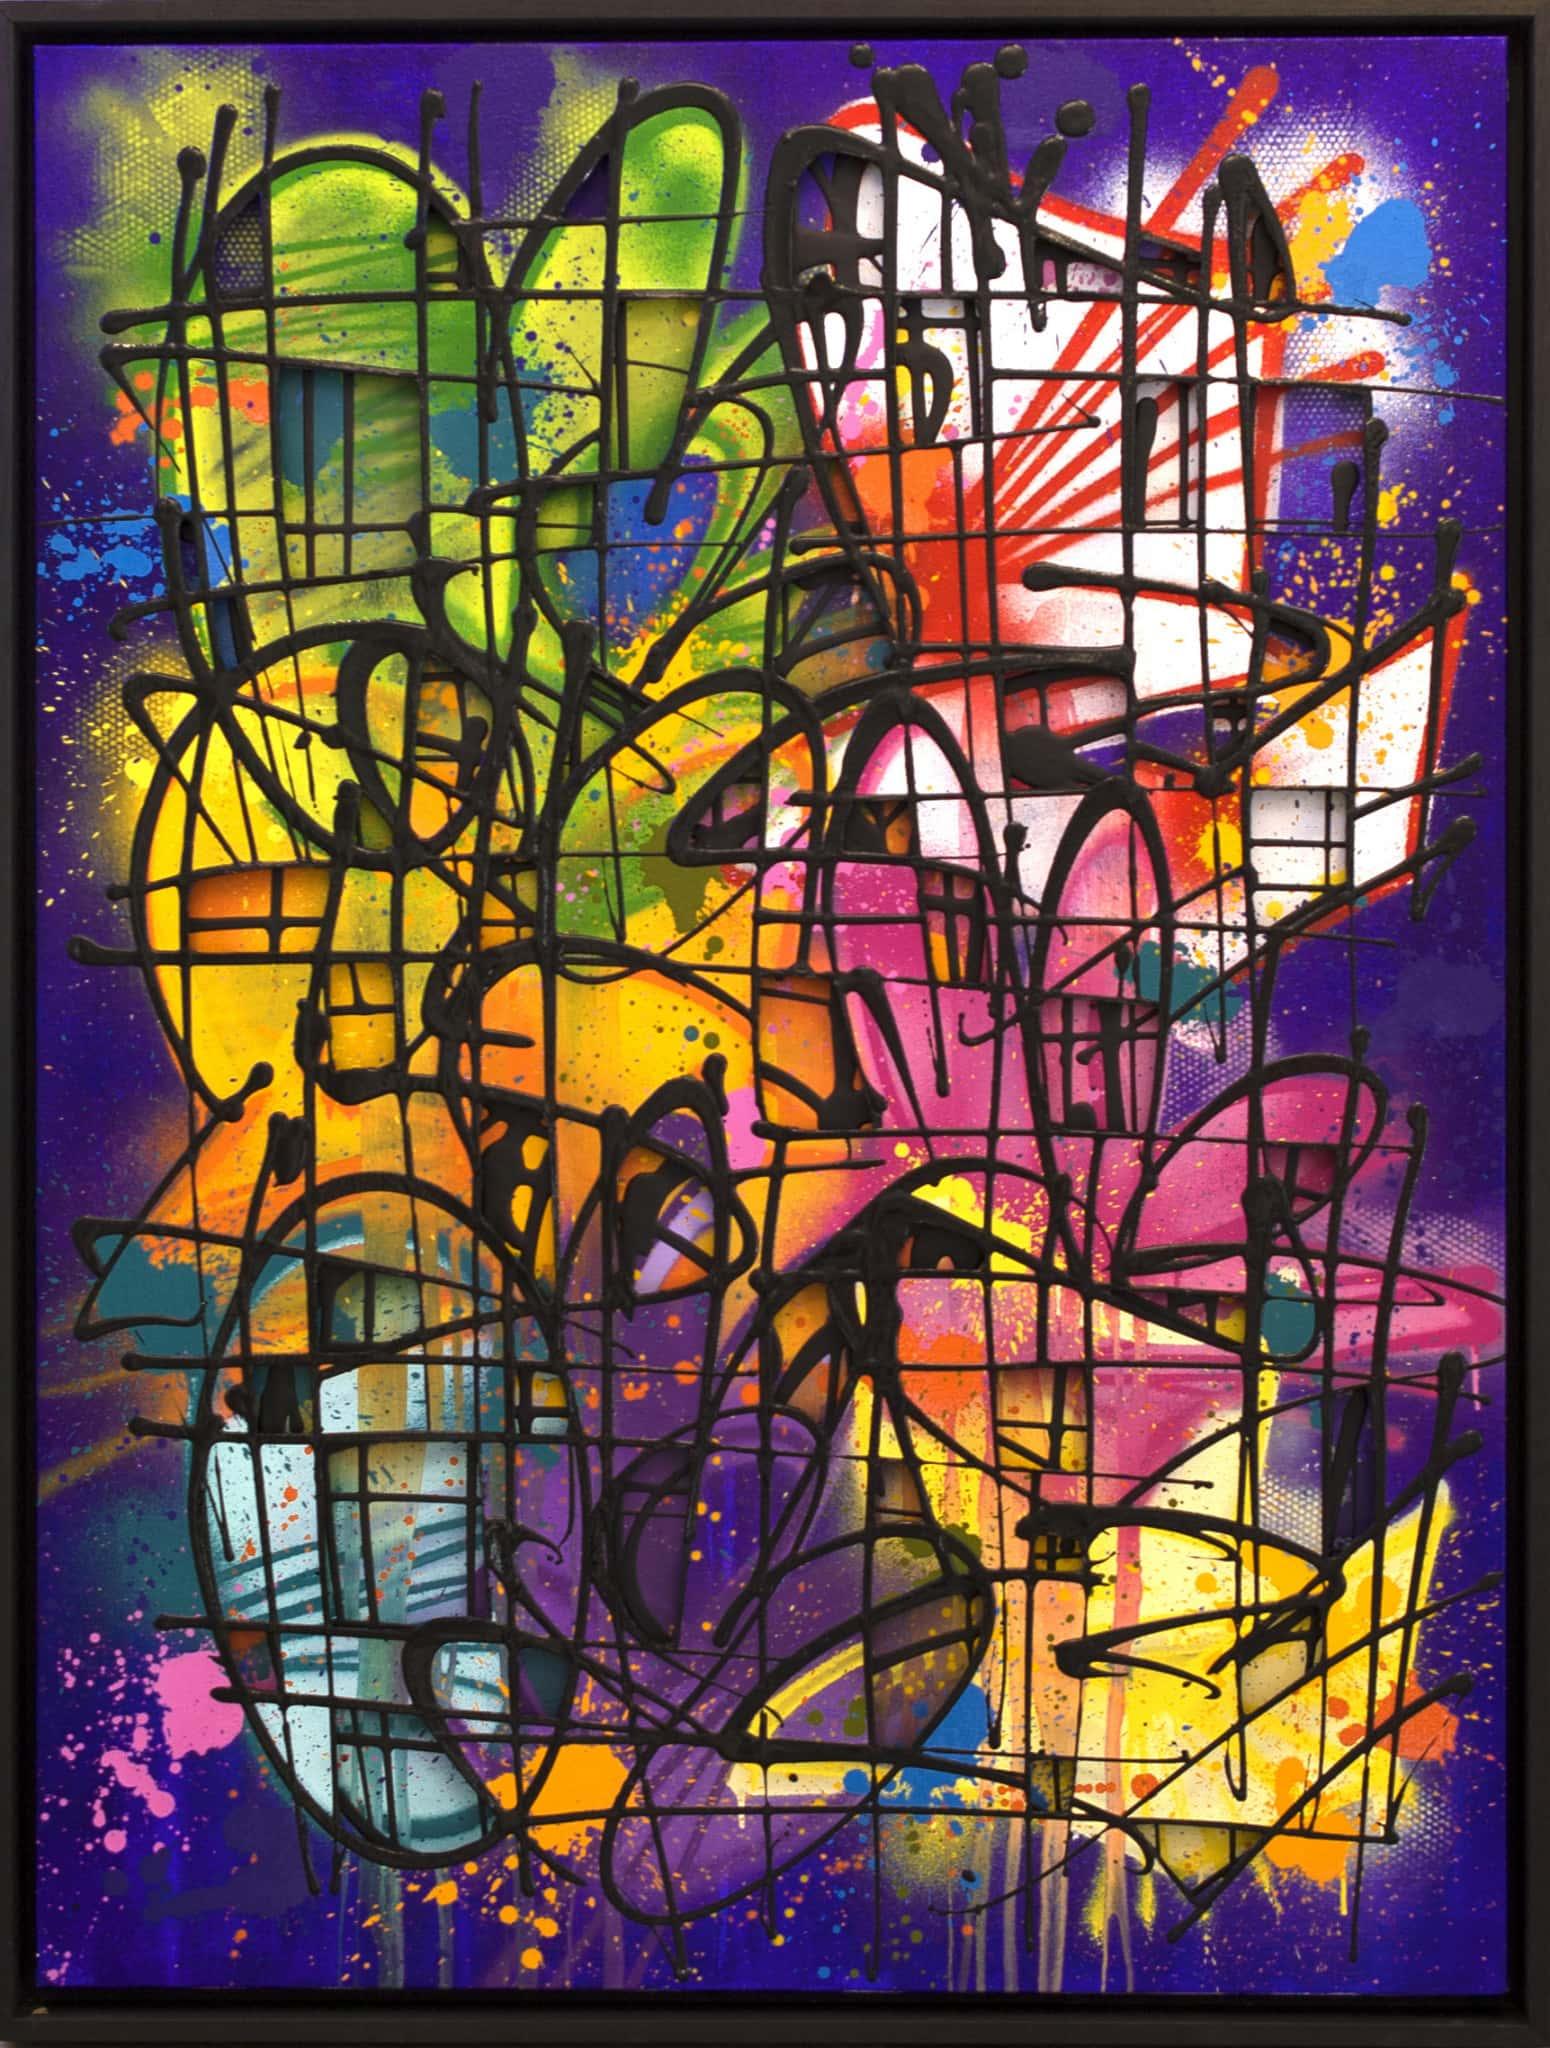 Galerie Art Jingle NEBAY Esprit Malin 130 x 97 cm 2021